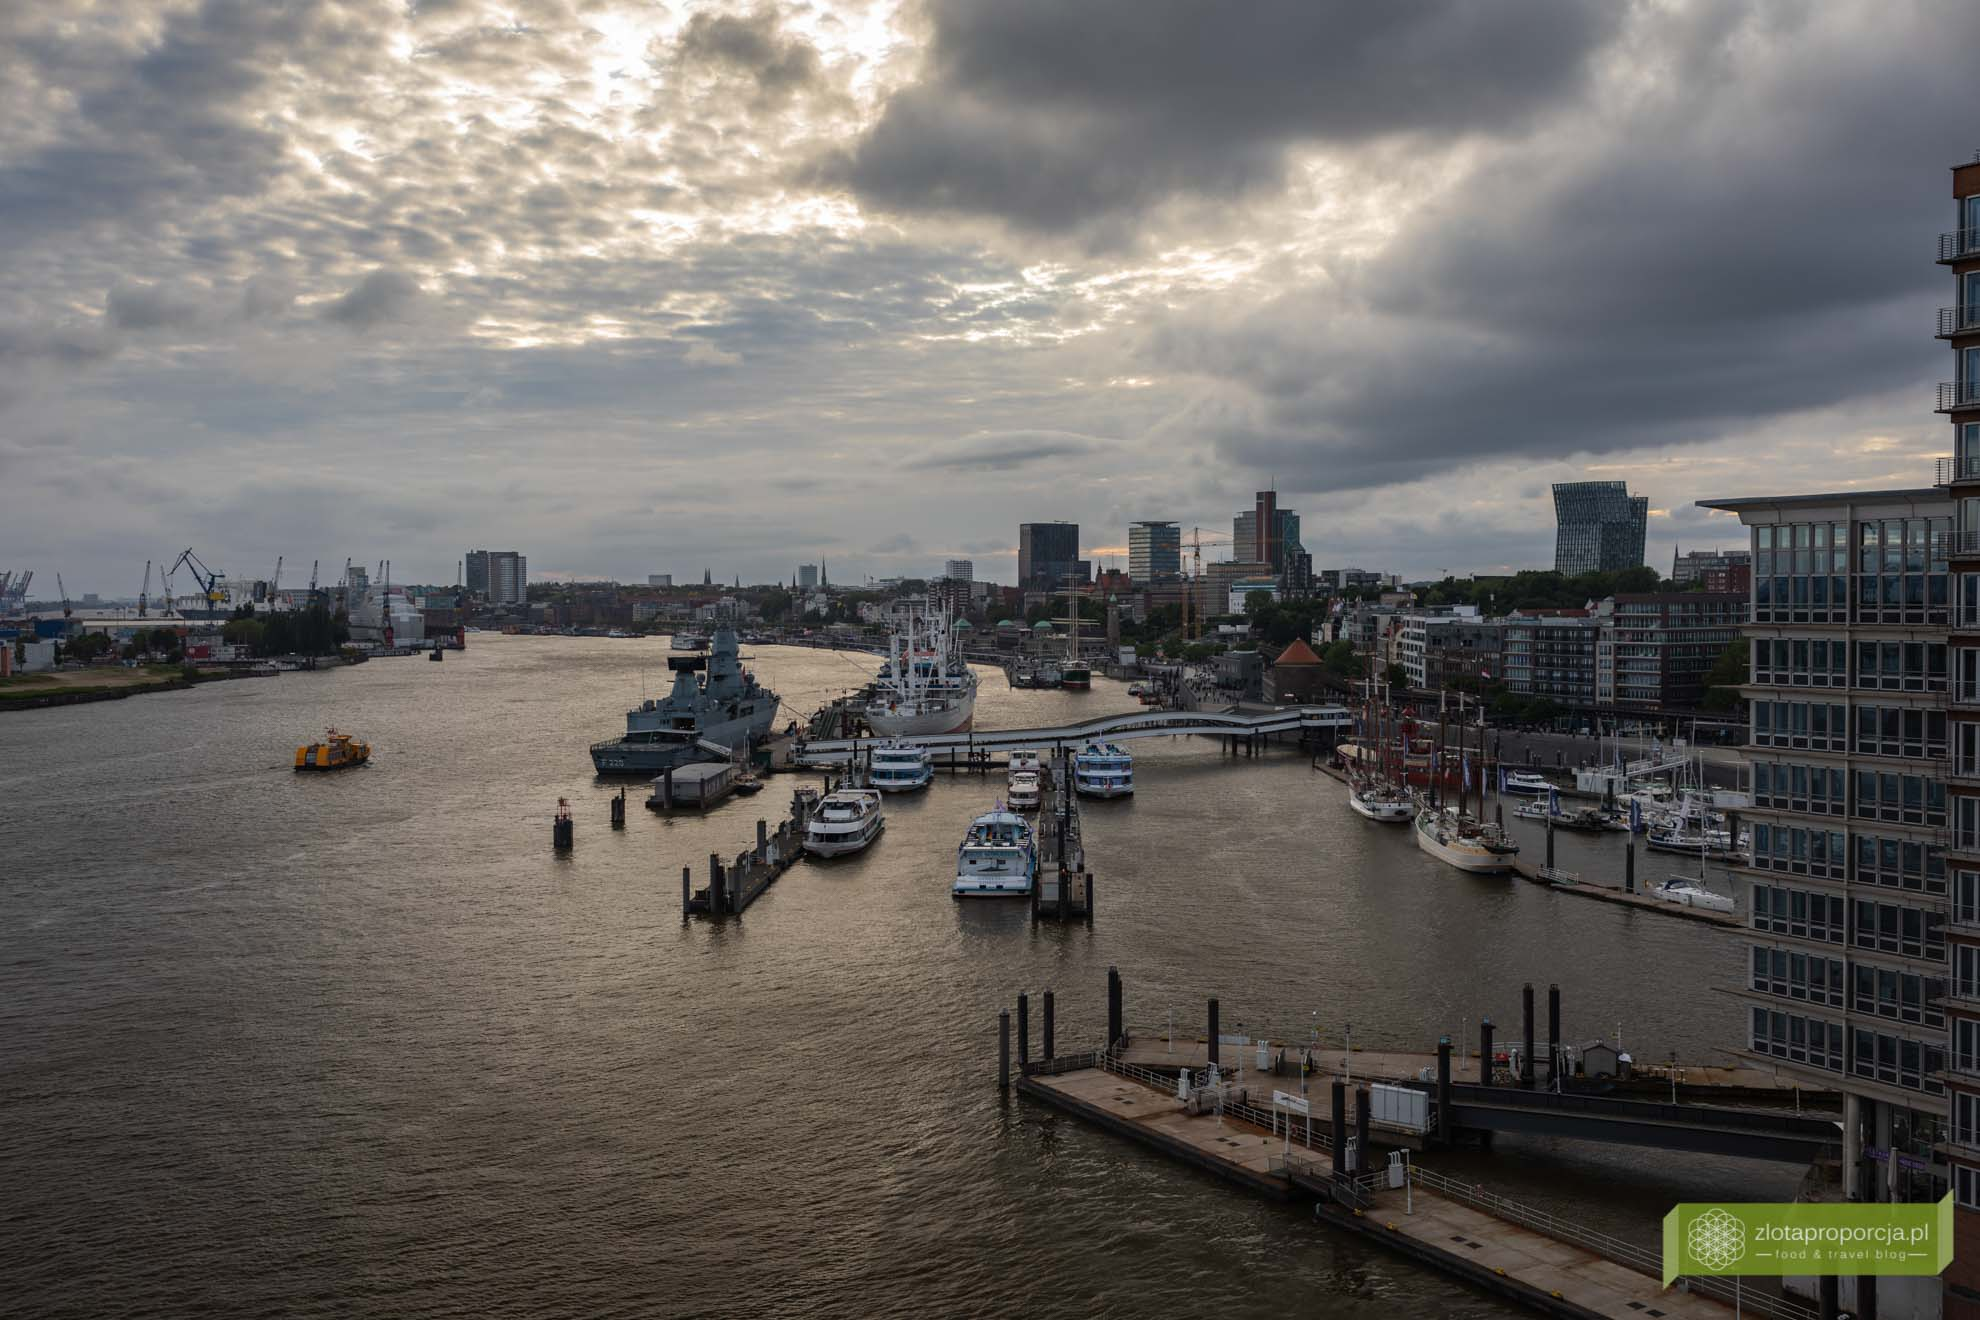 Elbphilharmonie; Hamburg, atrakcje Hamburga, HafenCity; elbphilharmonie w hamburgu; filharmonia w Hamburgu; Niemcy; atrakcje Niemiec;